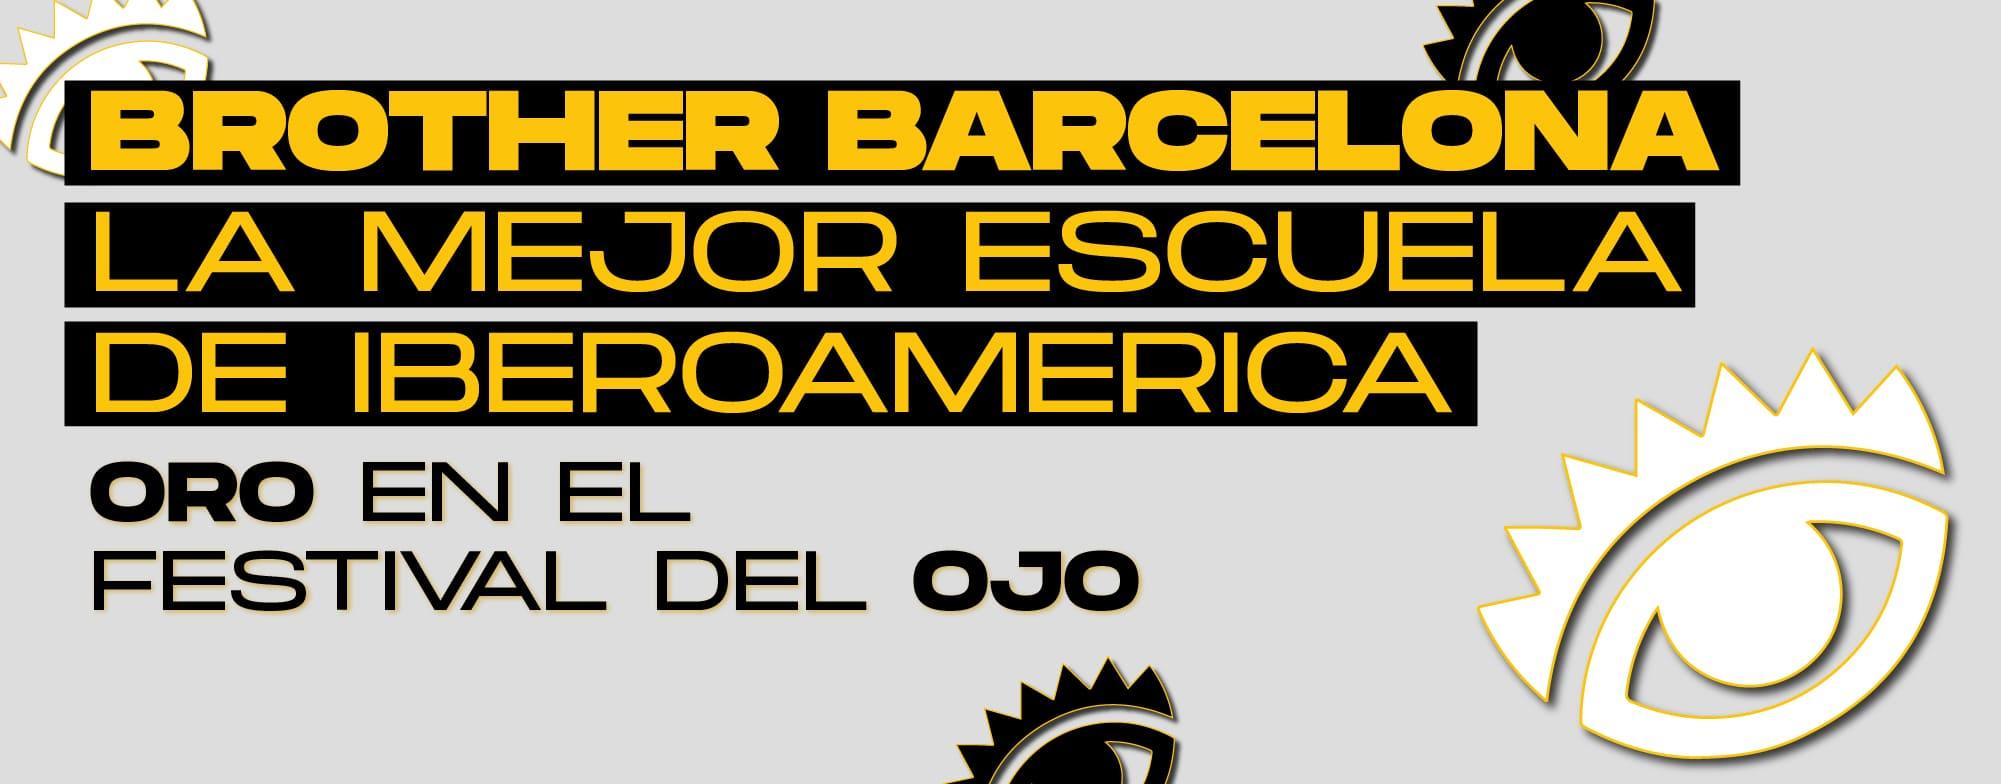 banner-web-ojo-de-iberoamerica-la-mejor-escuela-brother